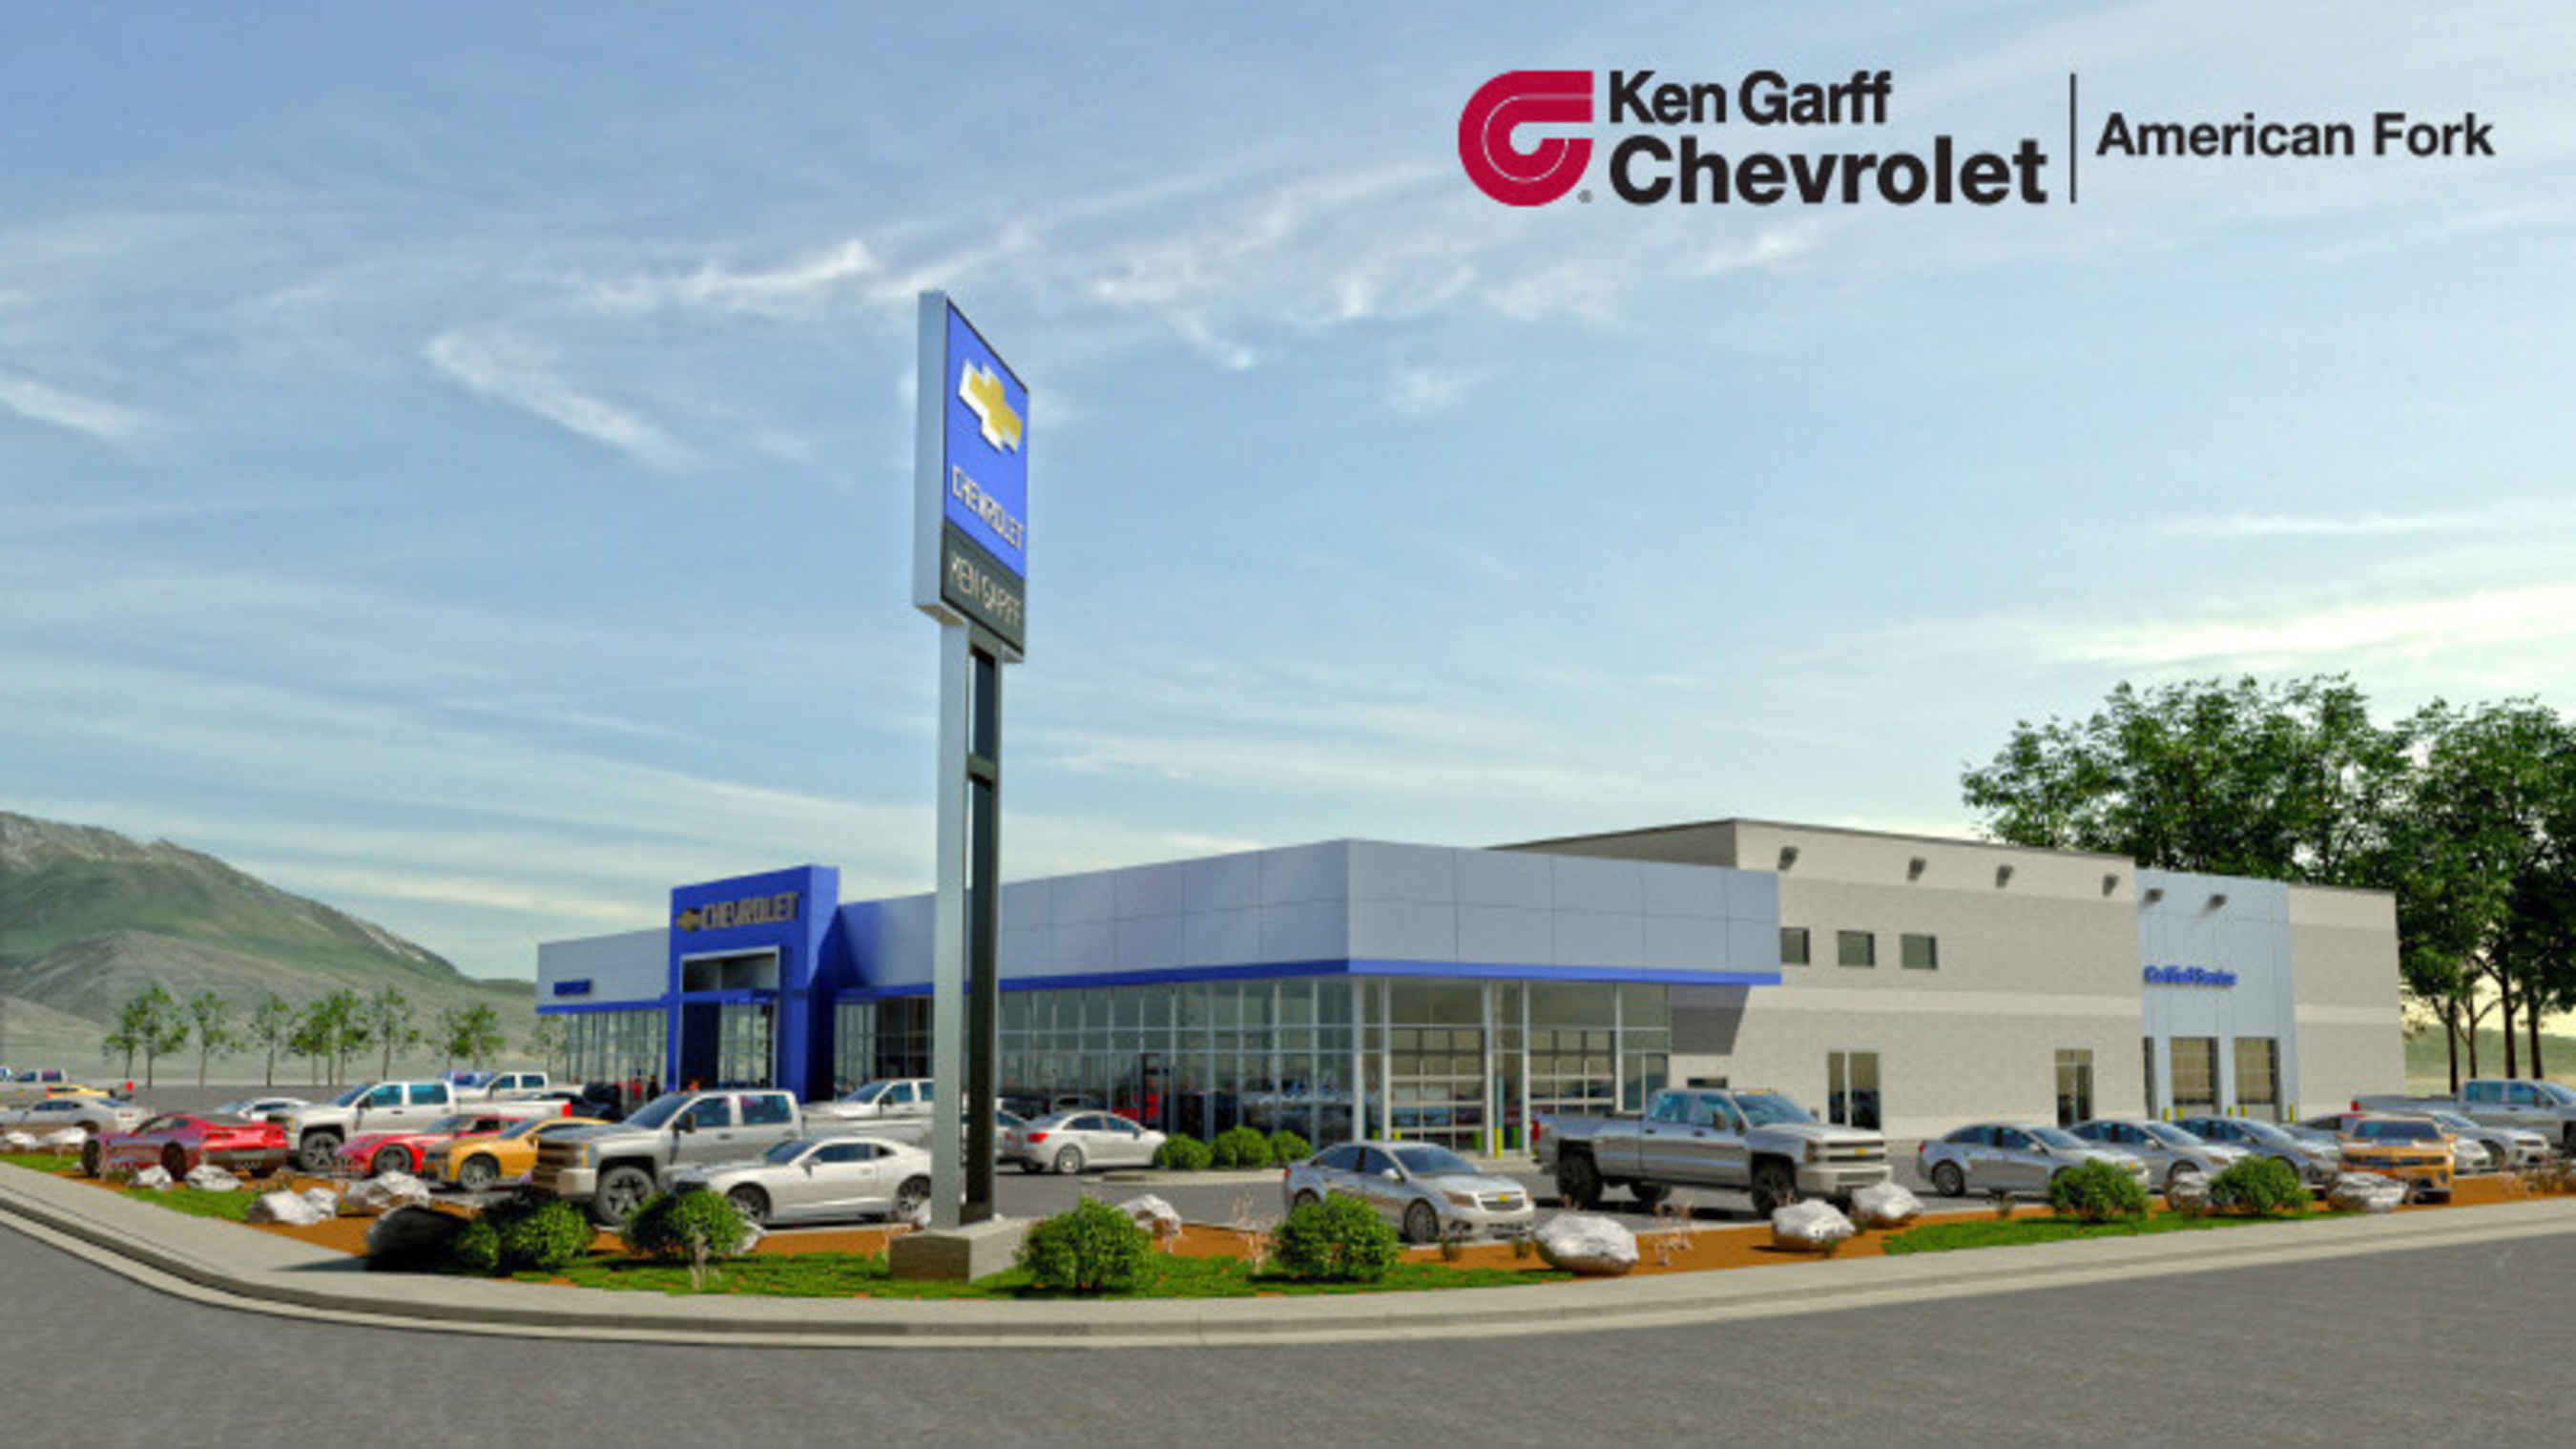 Ken Garff American Fork >> Ken Garff Chevrolet Moves To Expanded Location In American Fork